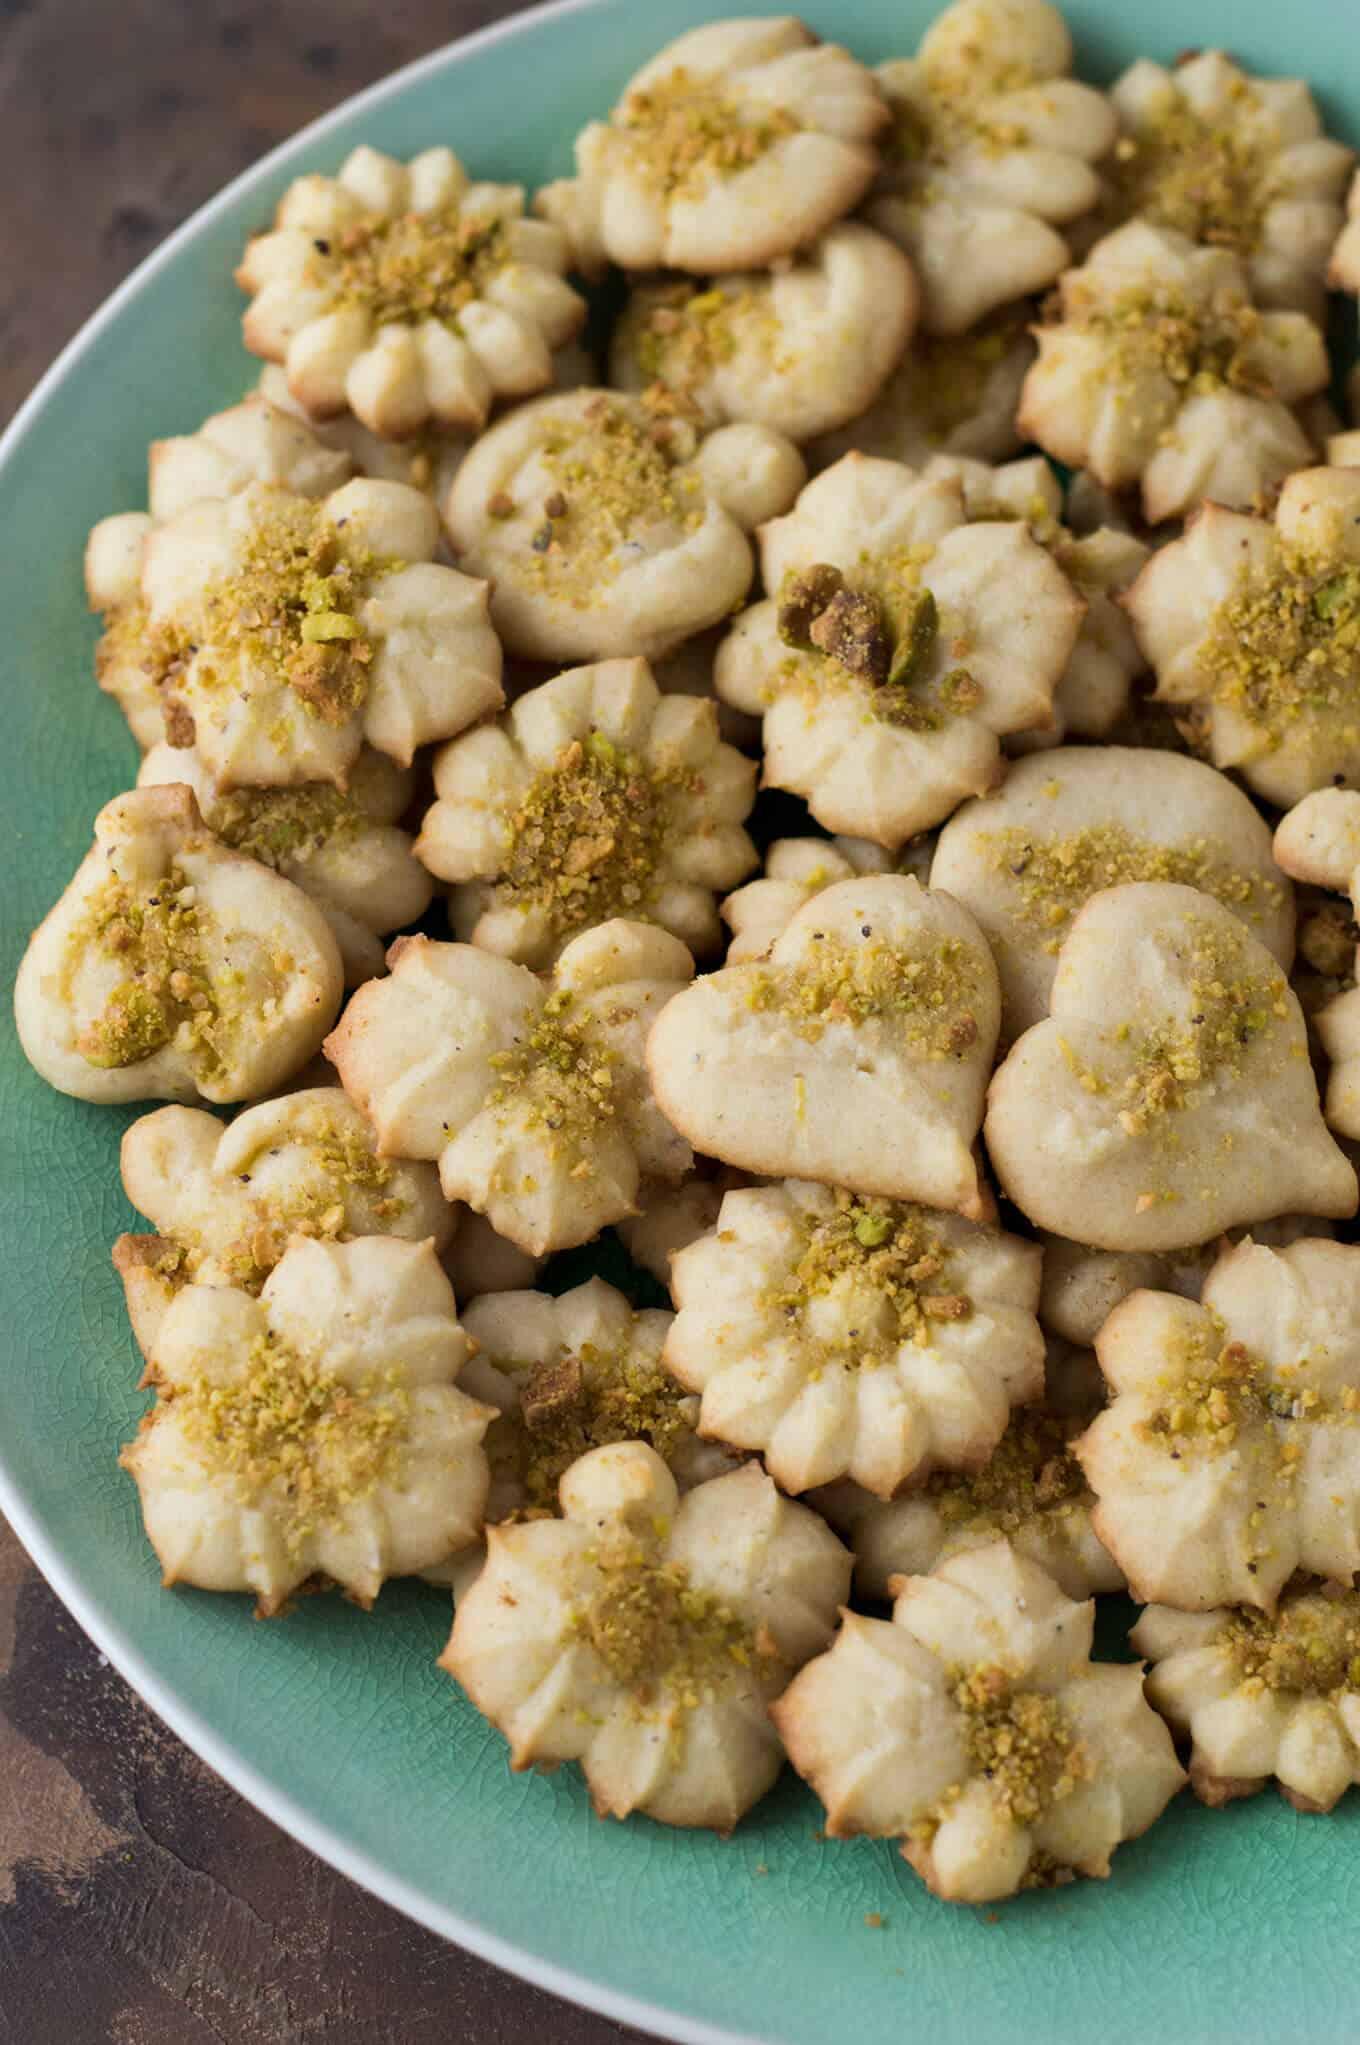 A plate of lemon cardamom sugar cookies.